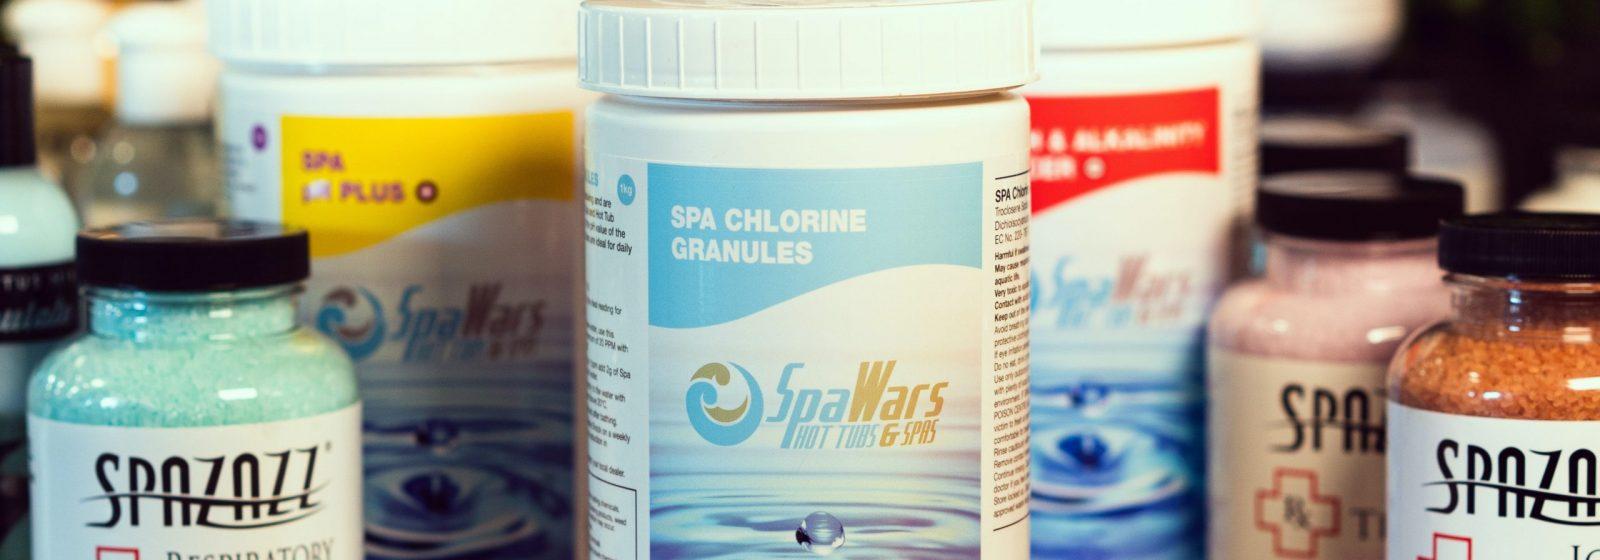 Best Choice Hot Tub Chemicals